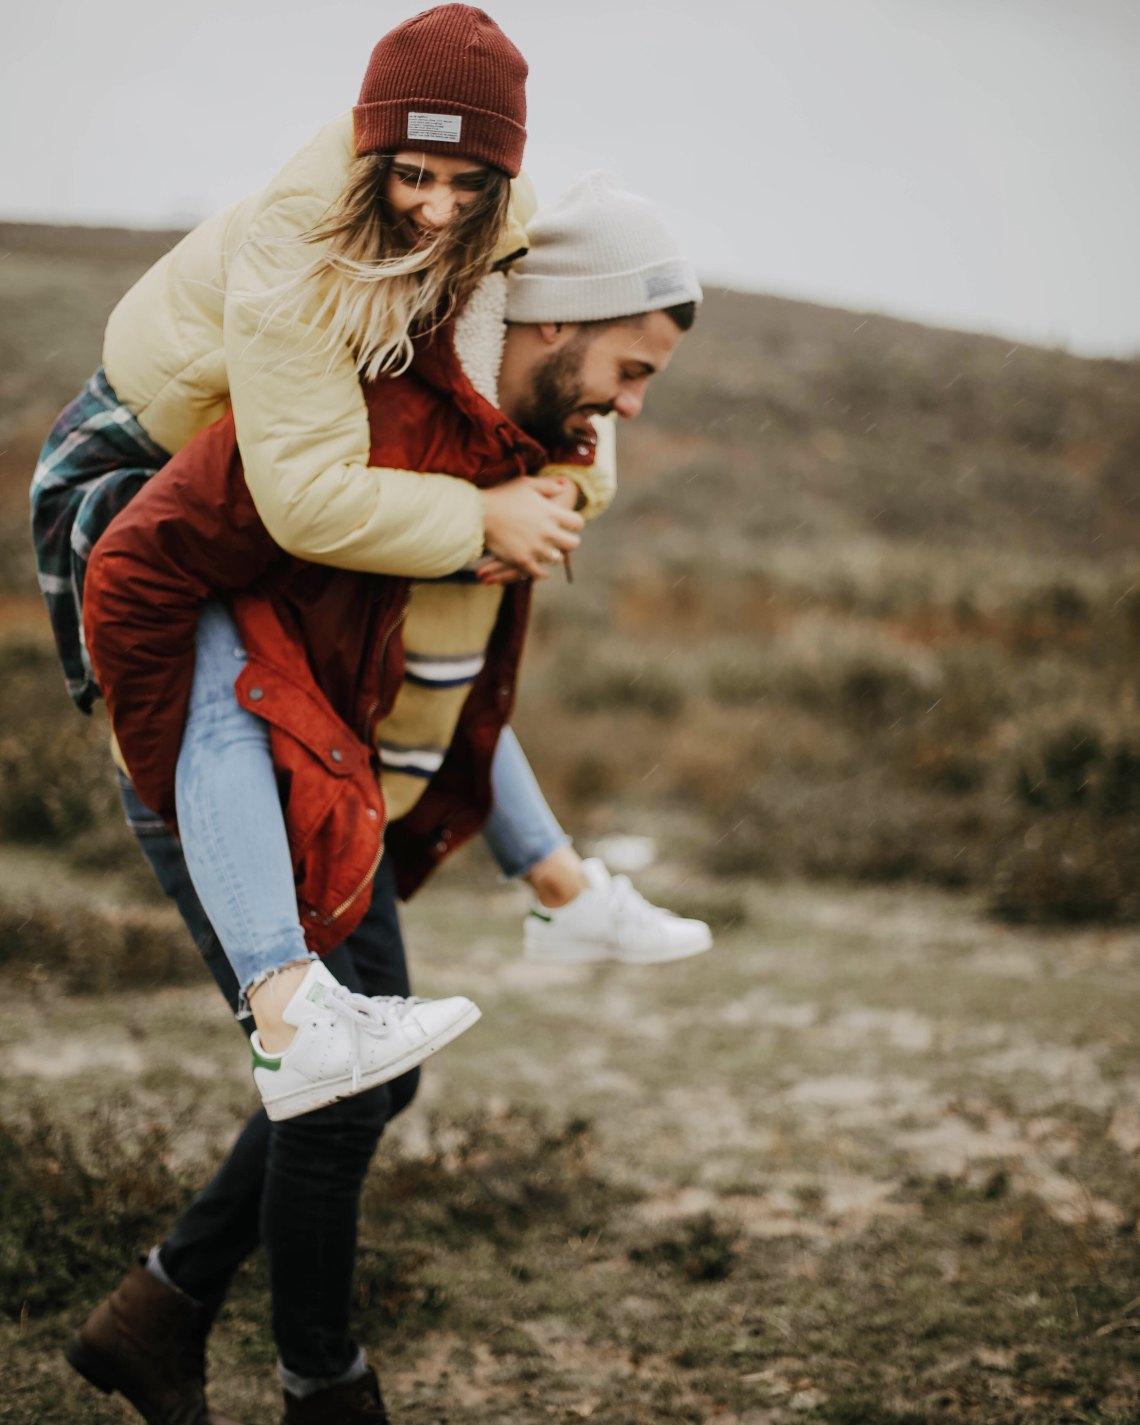 A girl chasing a boy